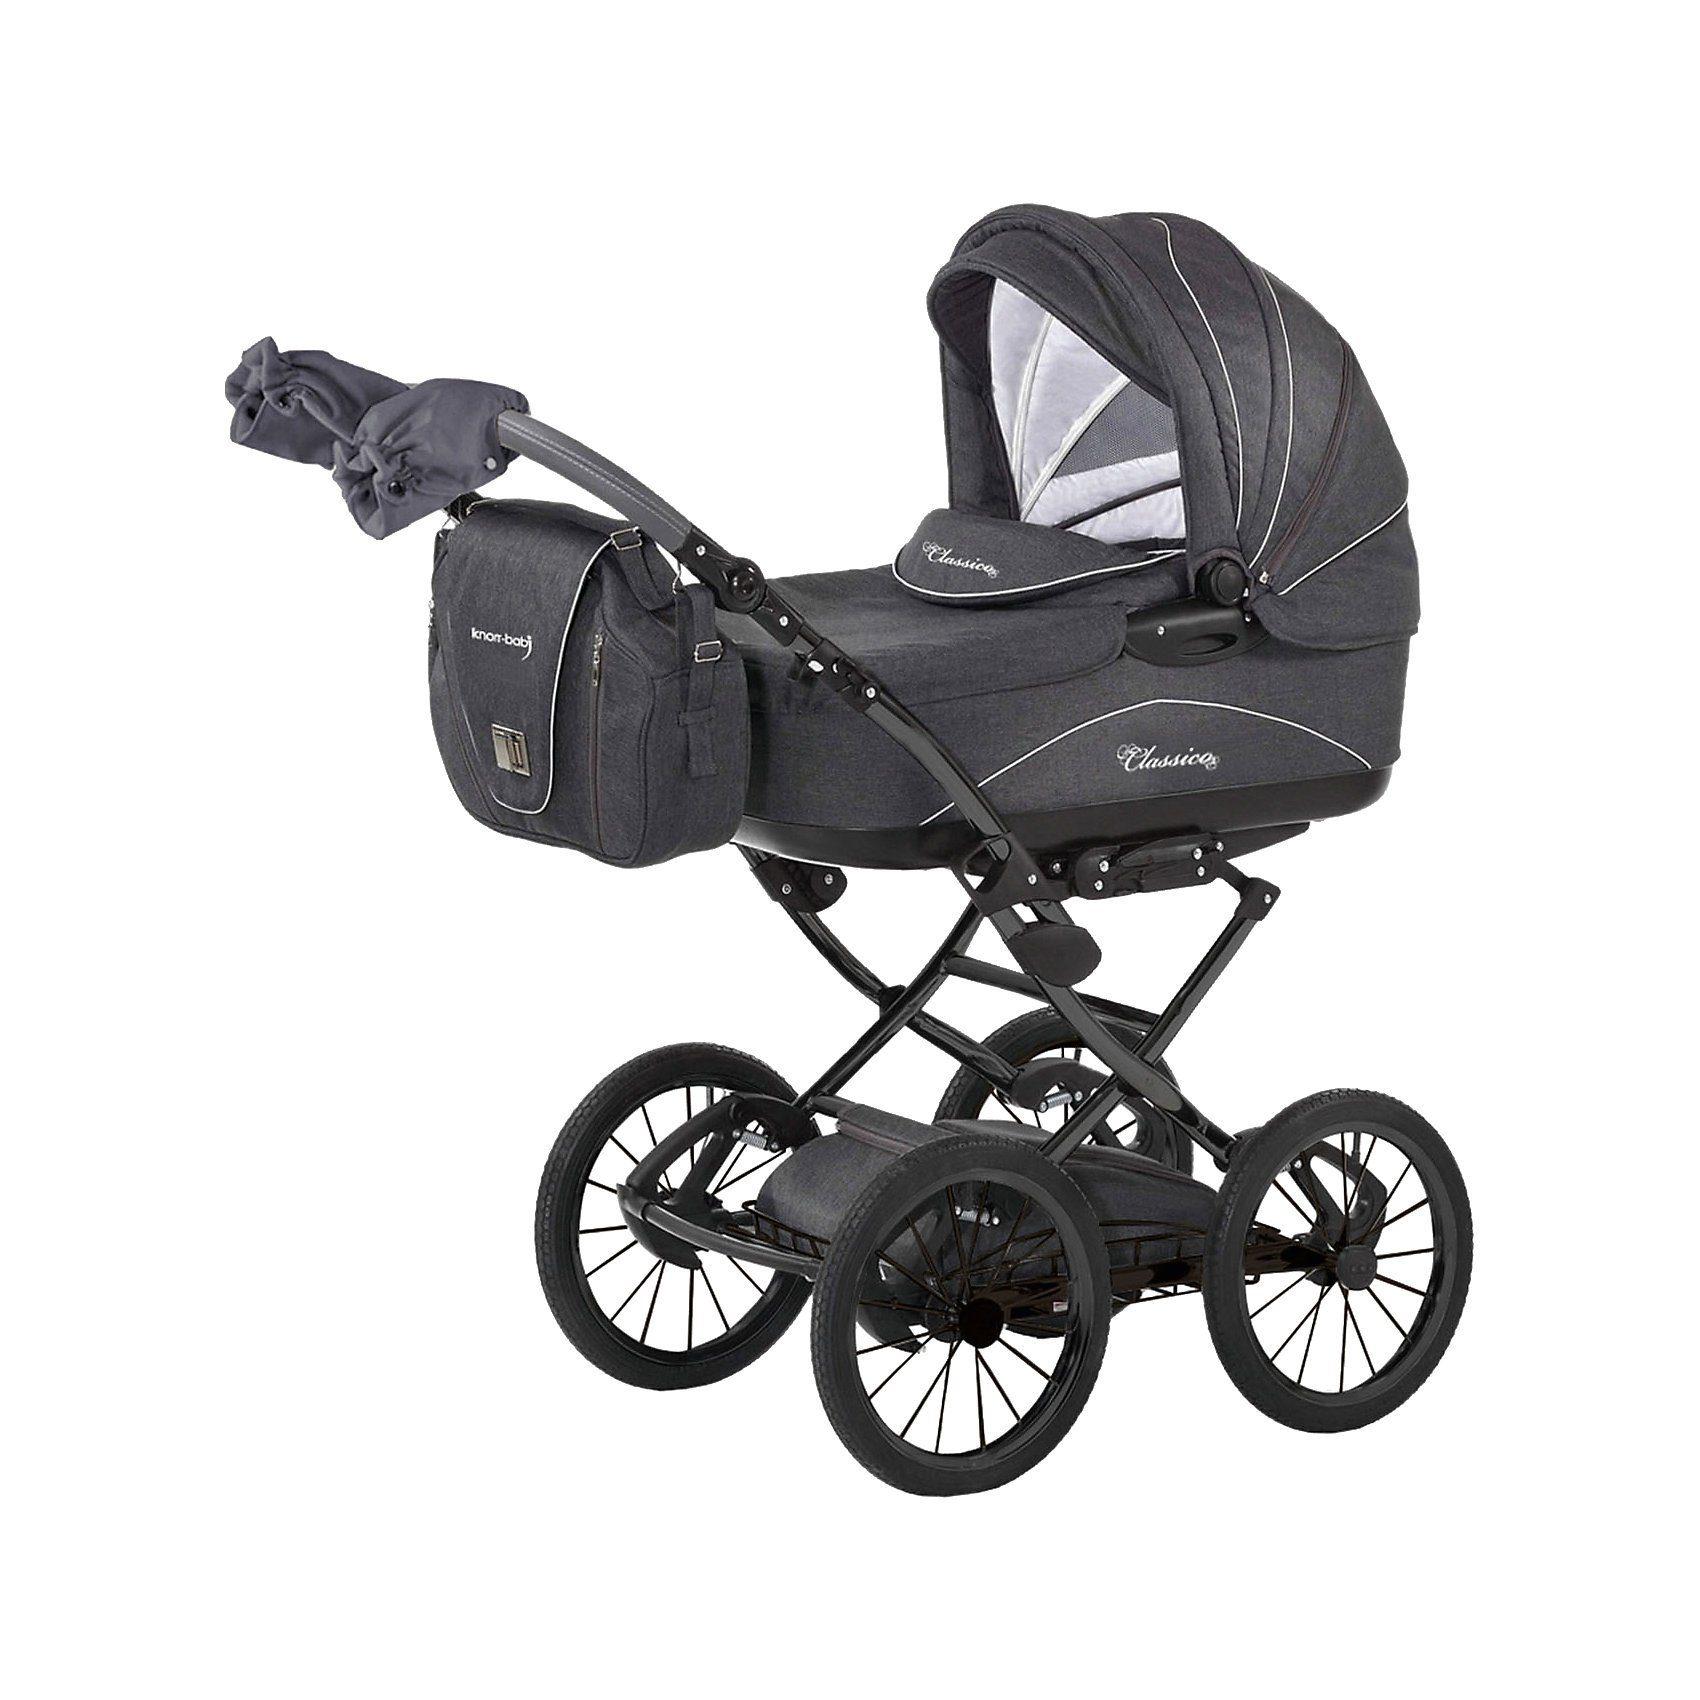 knorr-baby Kombi Kinderwagen Classico mit Wickeltasche & Handwärmer, gr